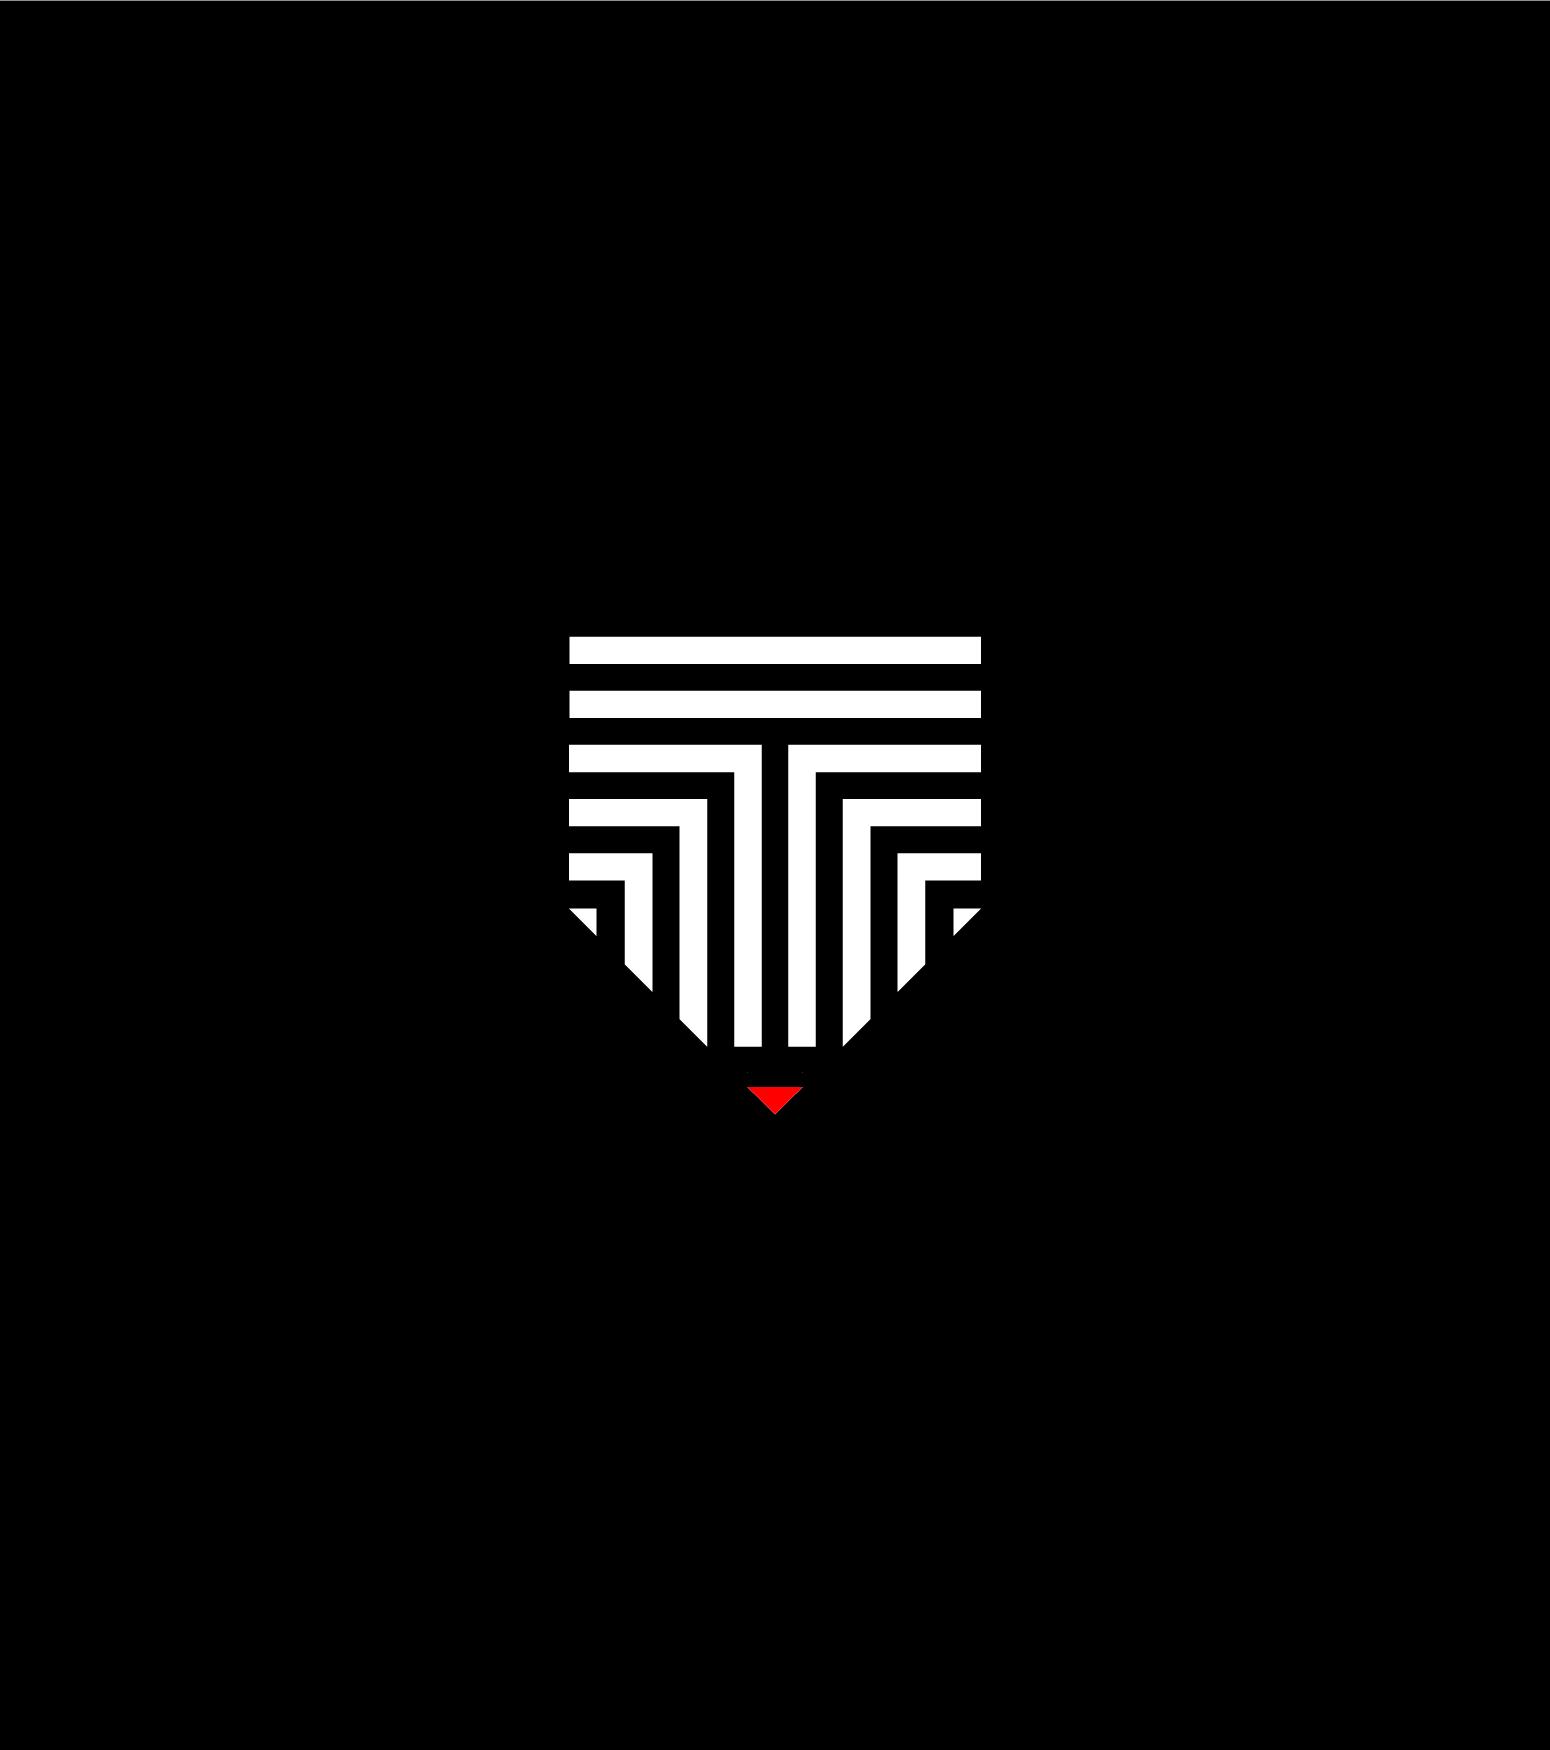 The Trillion Brand identity